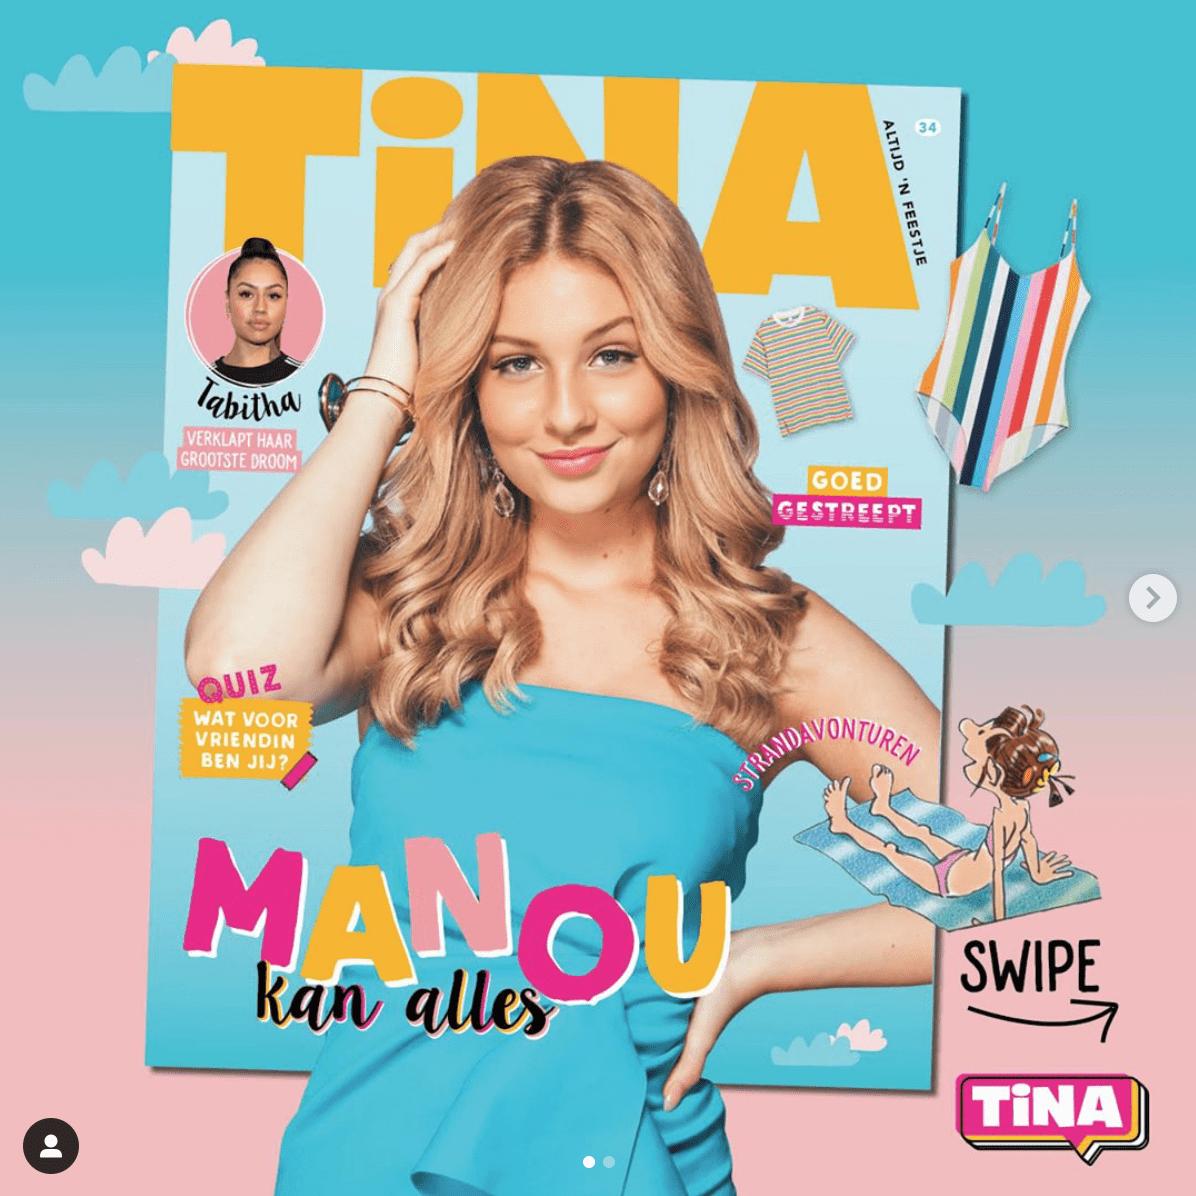 tina-tijdschrift-cover-manou-jue-cardoso